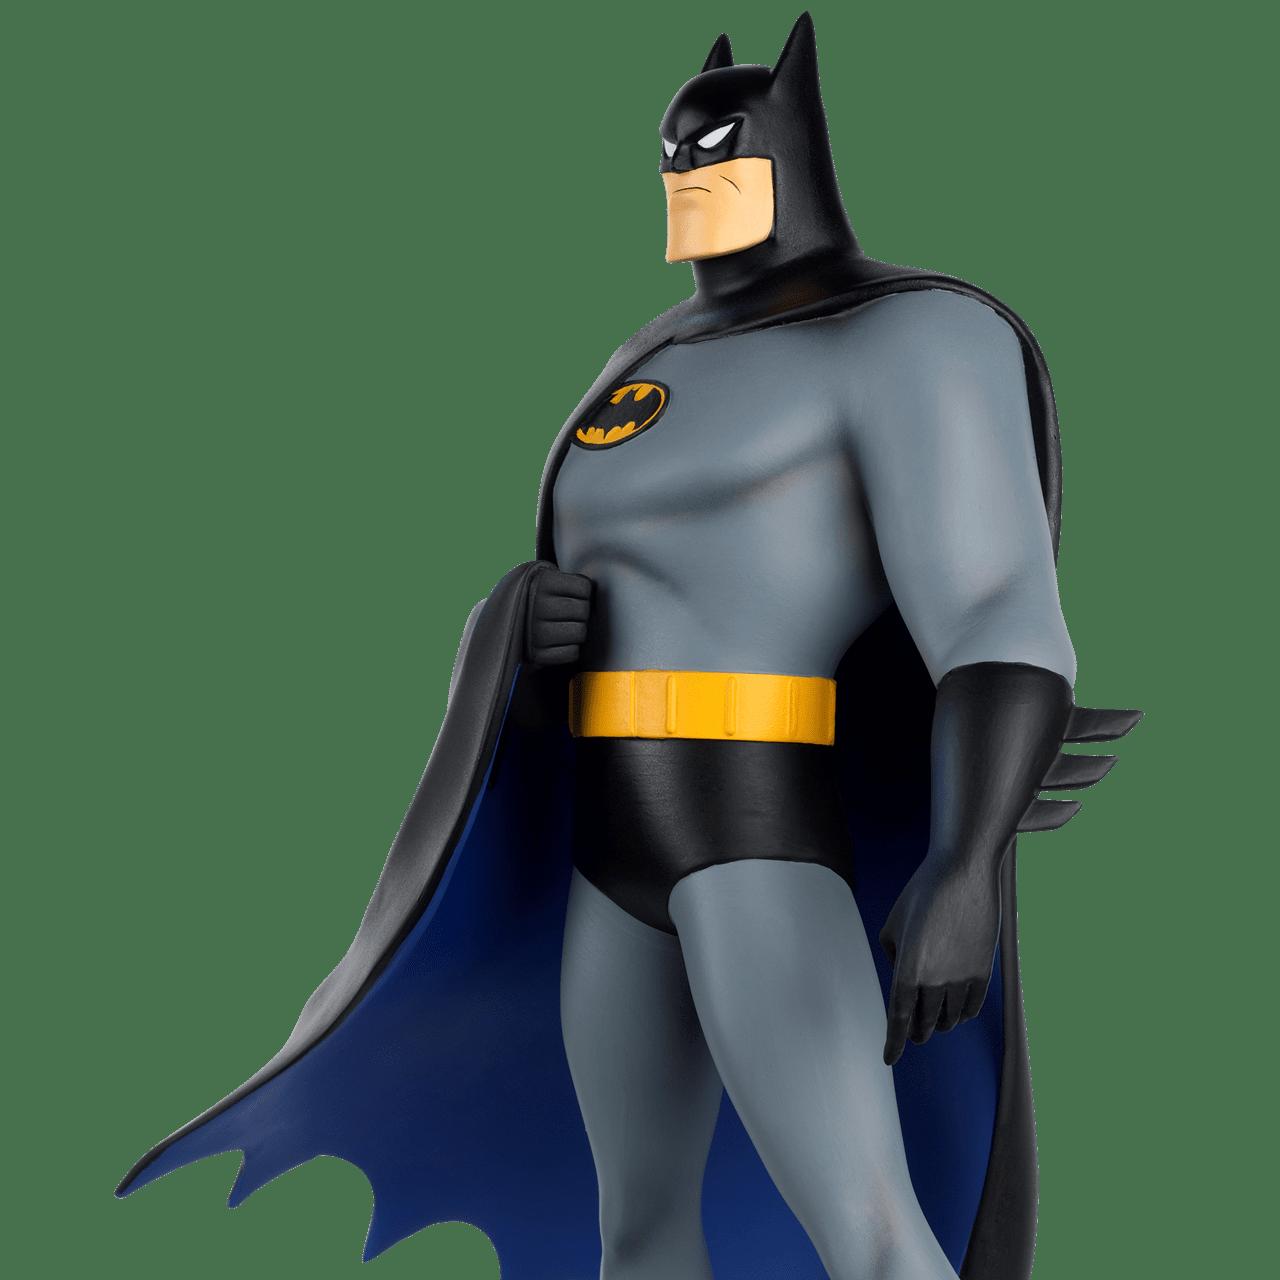 Batman Animation: DC Mega Figurine (online only) Hero Collector - 4